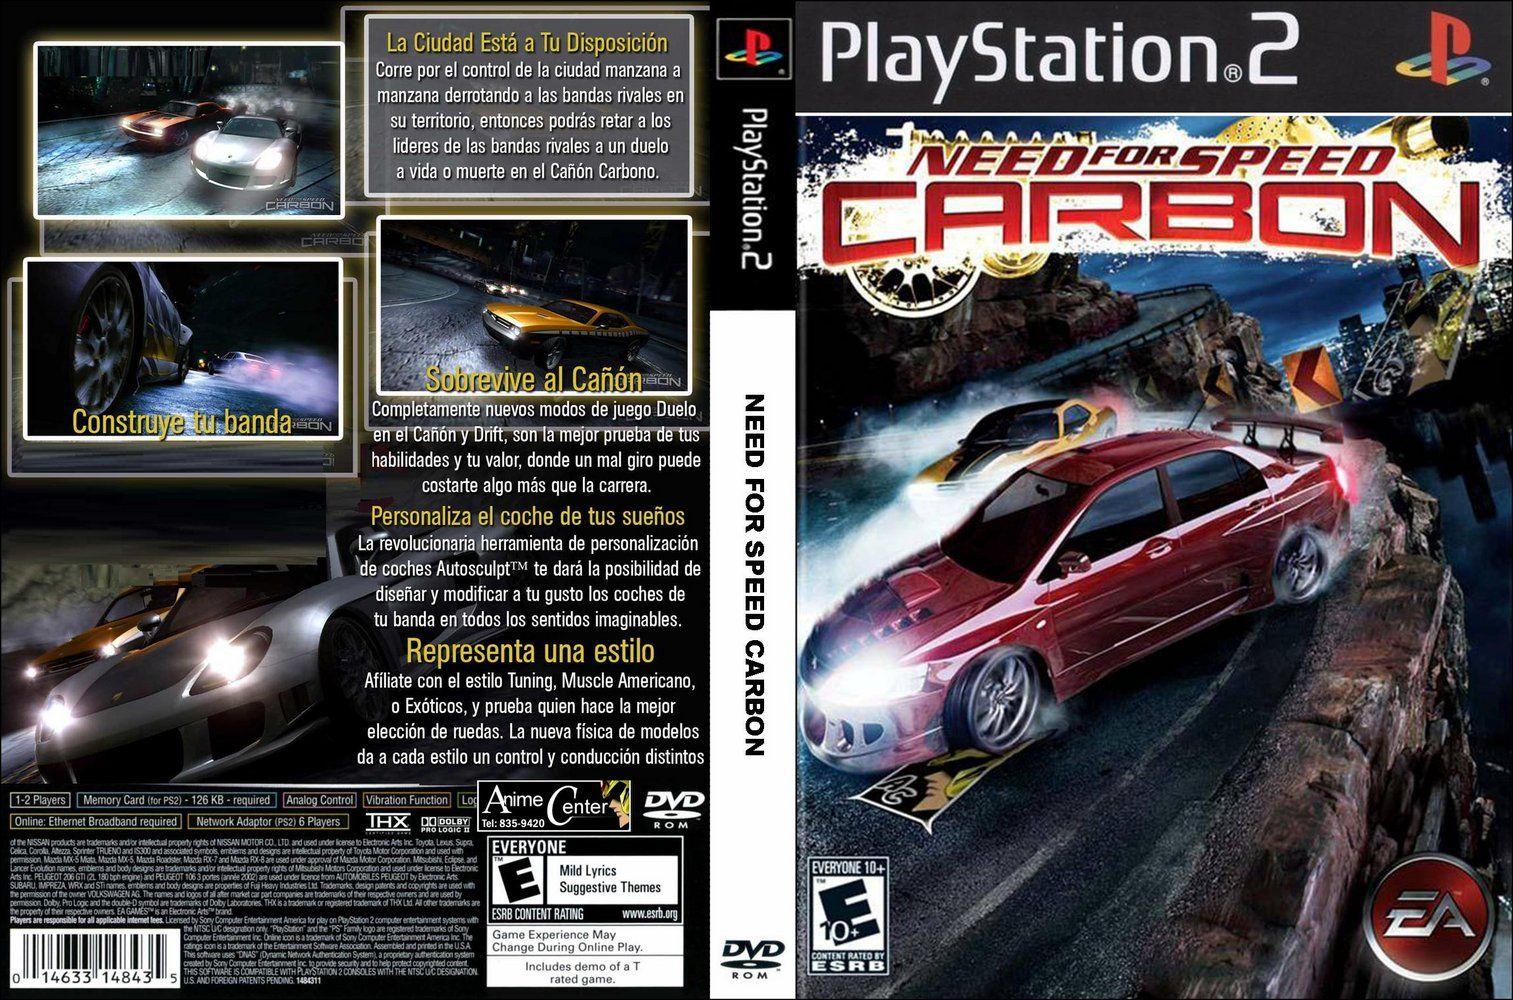 http://1.bp.blogspot.com/-1GmfCOcT9Ro/T3uvwfuitQI/AAAAAAAAAHw/PTV-Bp8yTWg/s1600/Need_For_Speed_Carbon-DVD-PS2.jpg